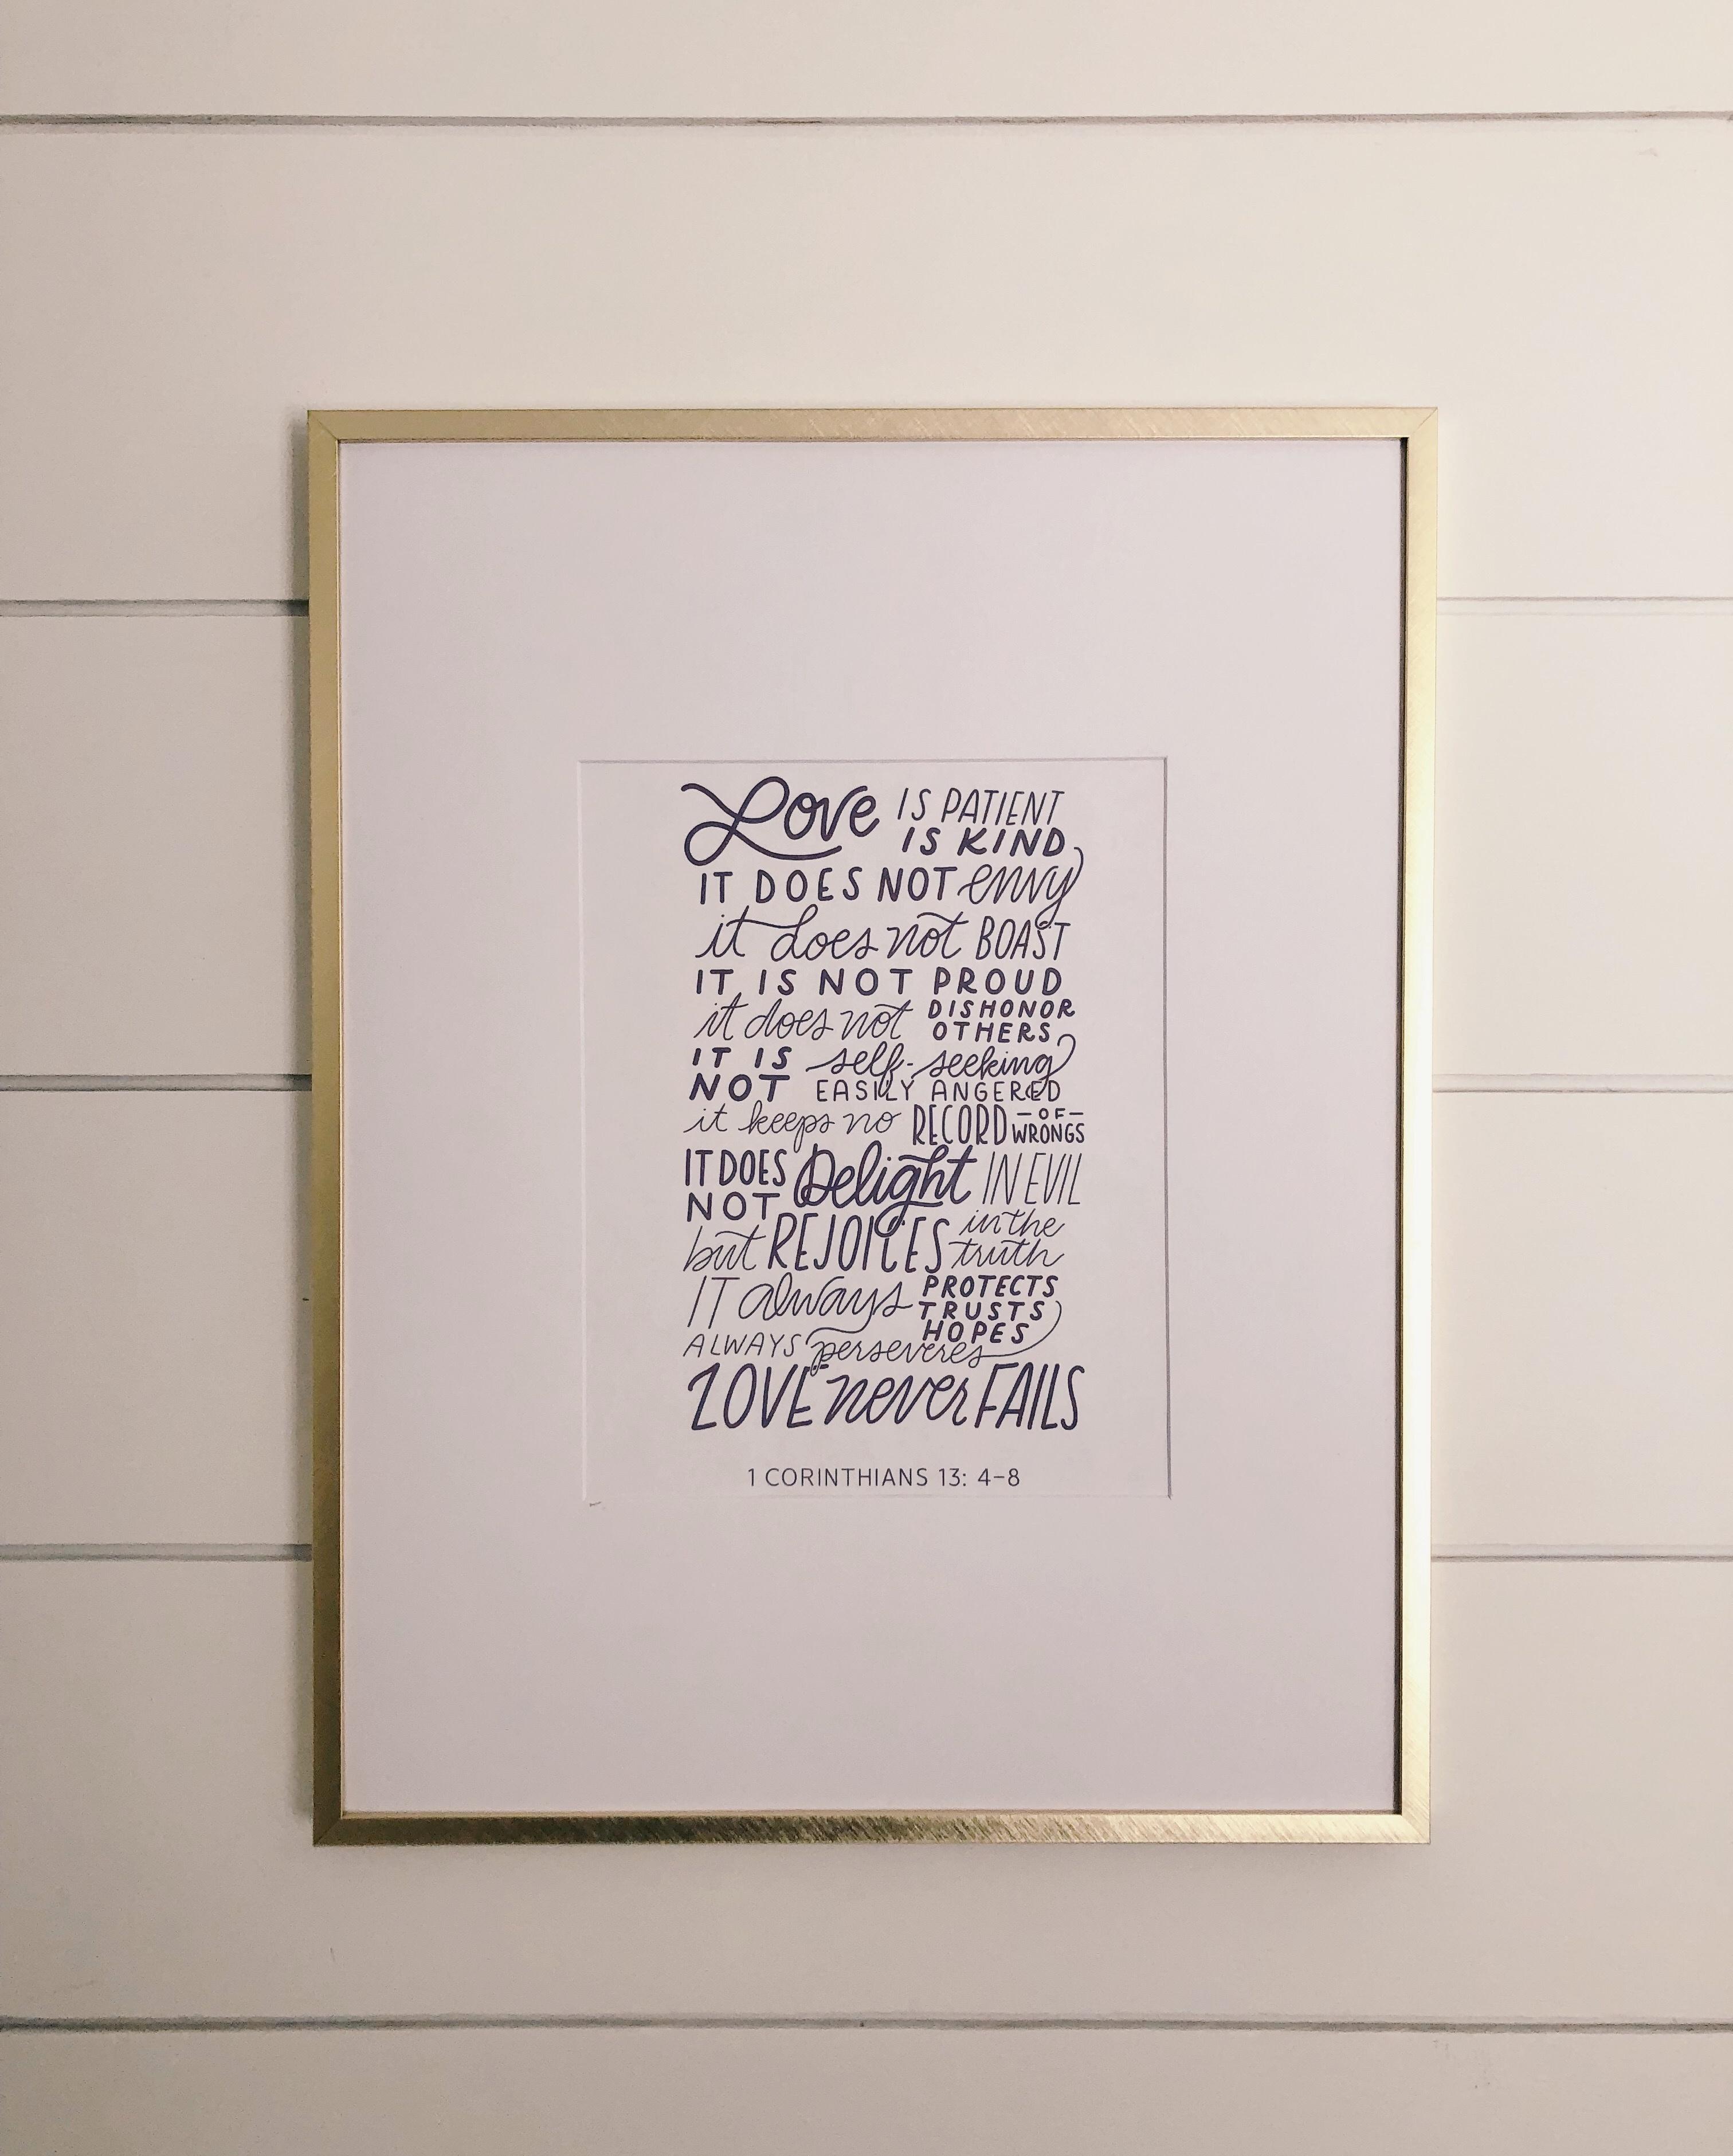 Love Is Patient, Love Is Kind | Free Printable | Harbor + Pine - Love Is Patient Love Is Kind Free Printable